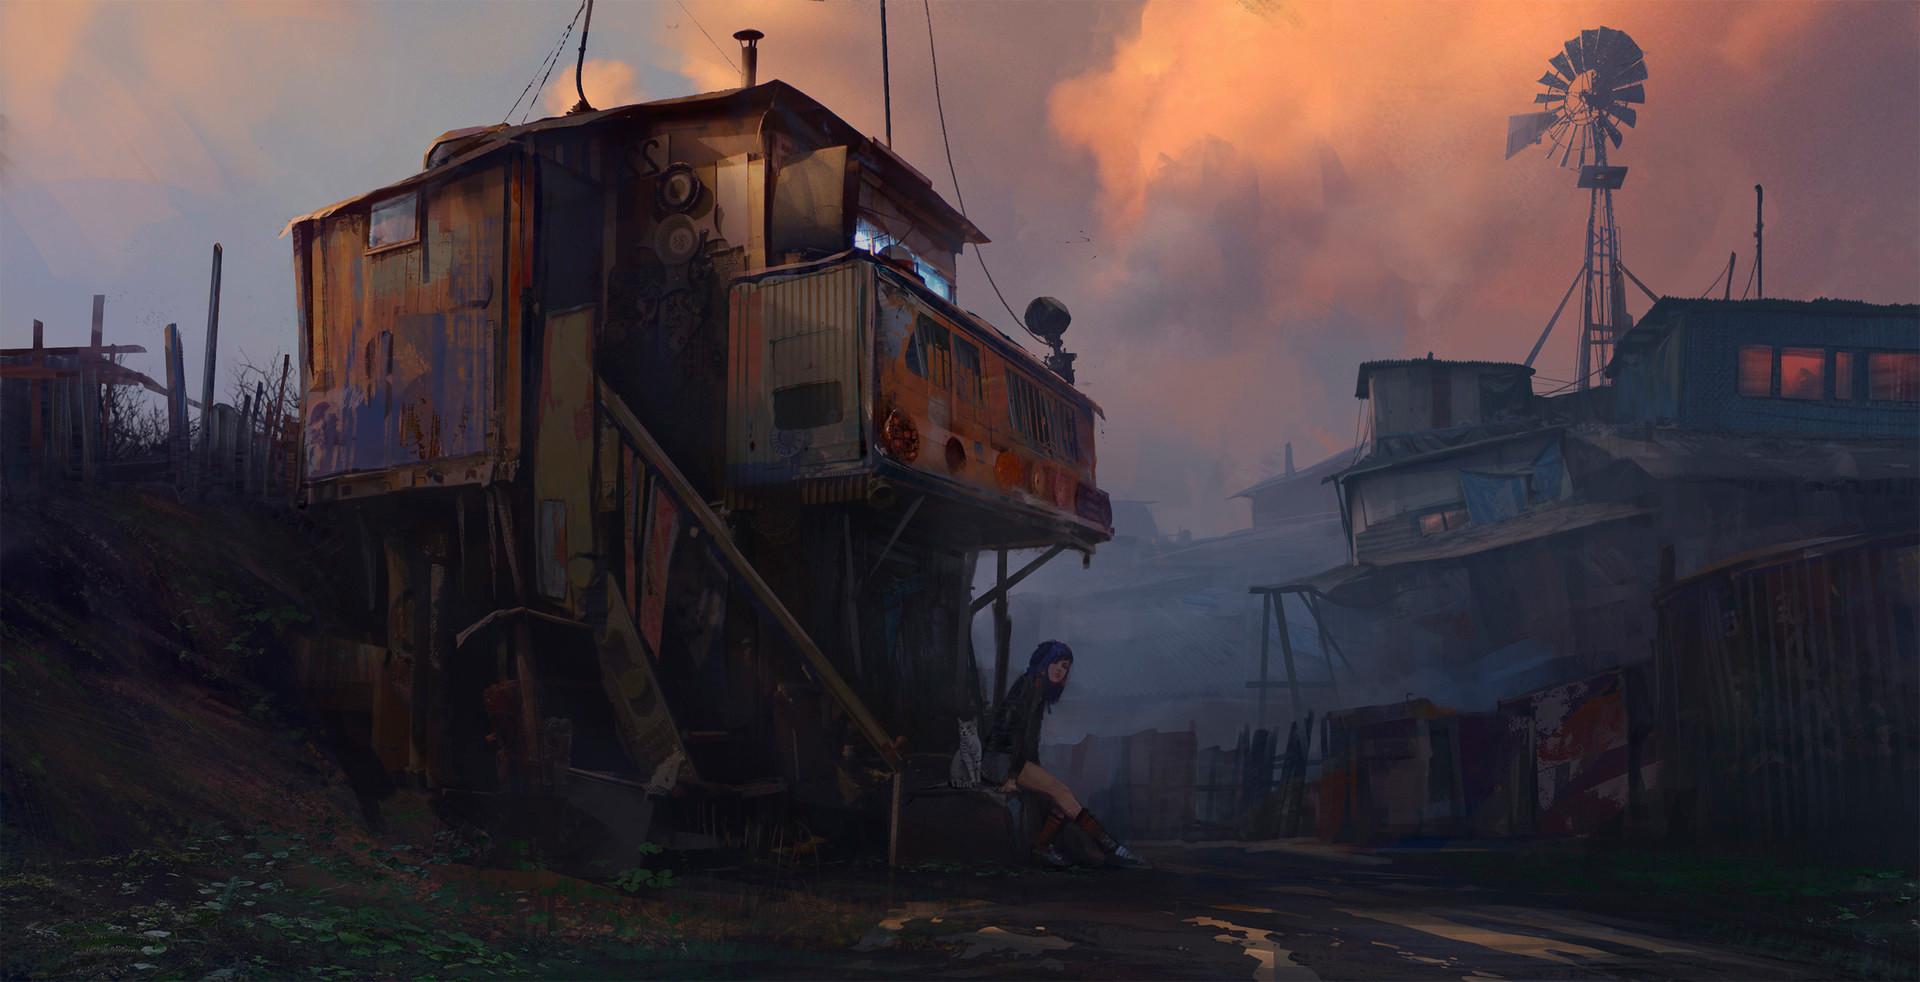 Sergey vasnev sergey vasnev sunset in slums exp